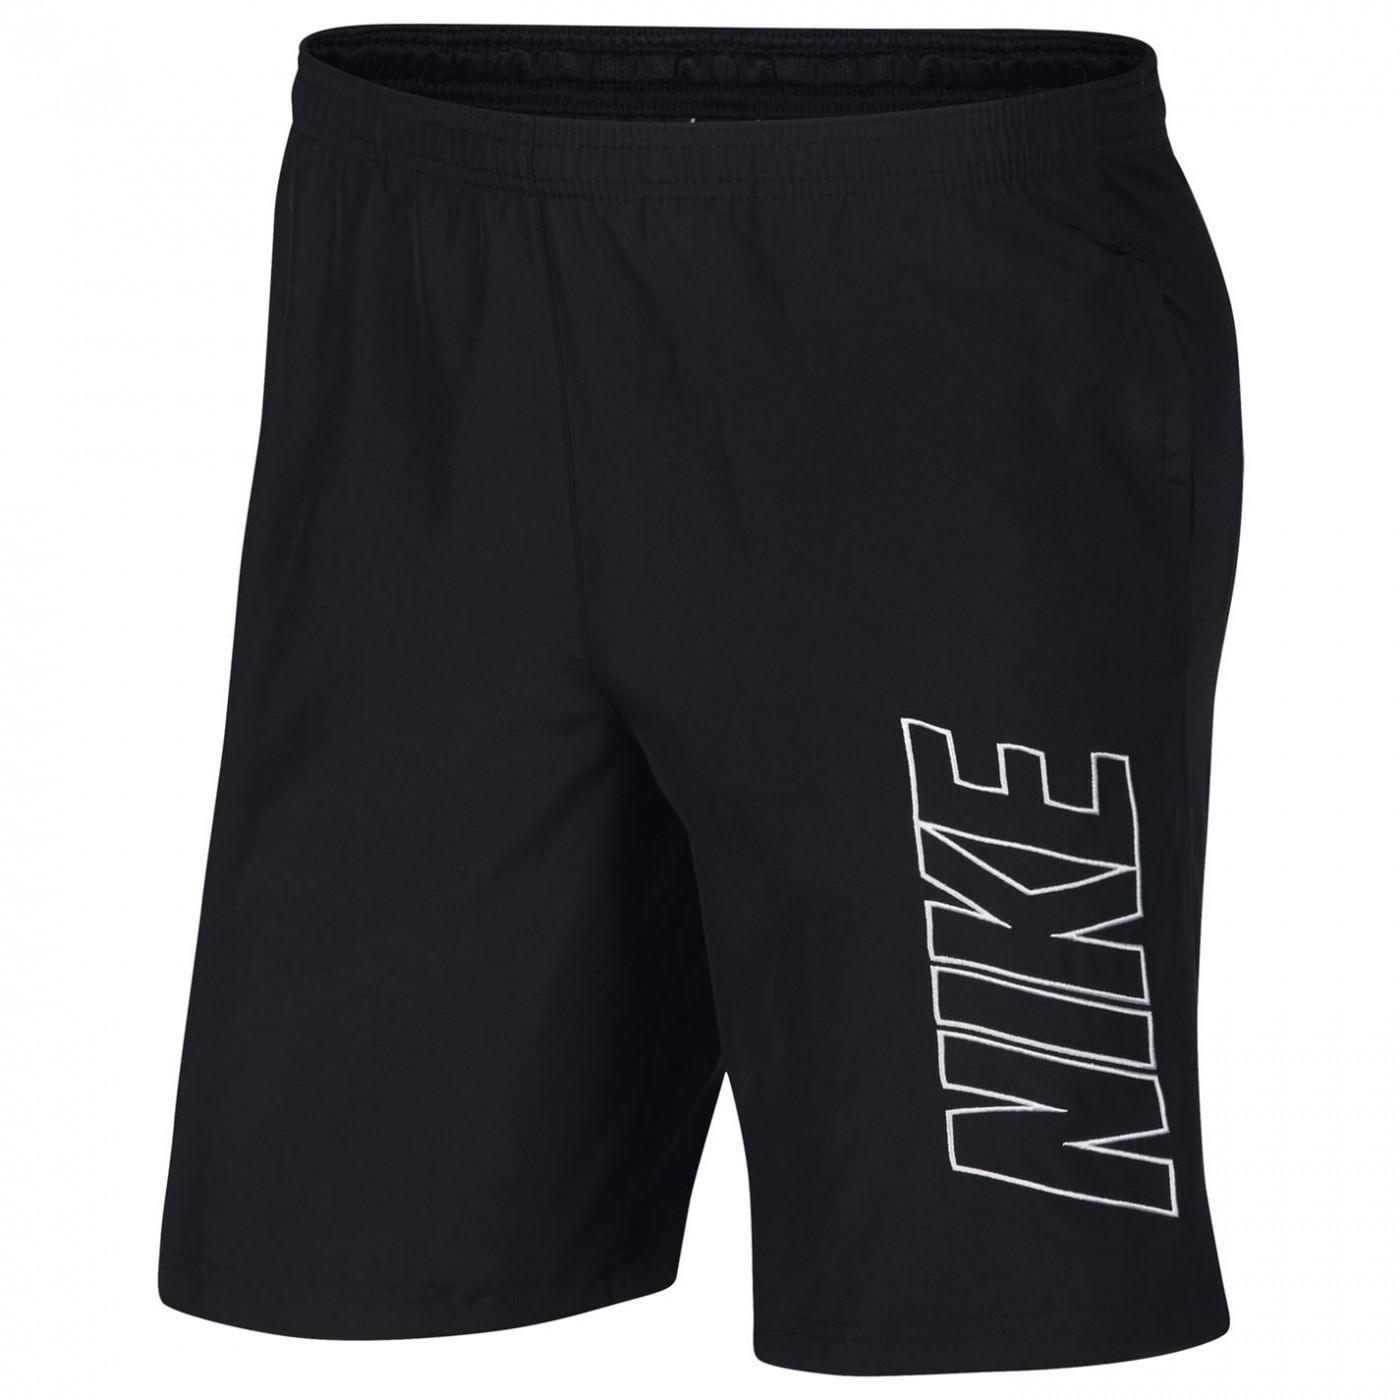 Men's shorts Nike Woven